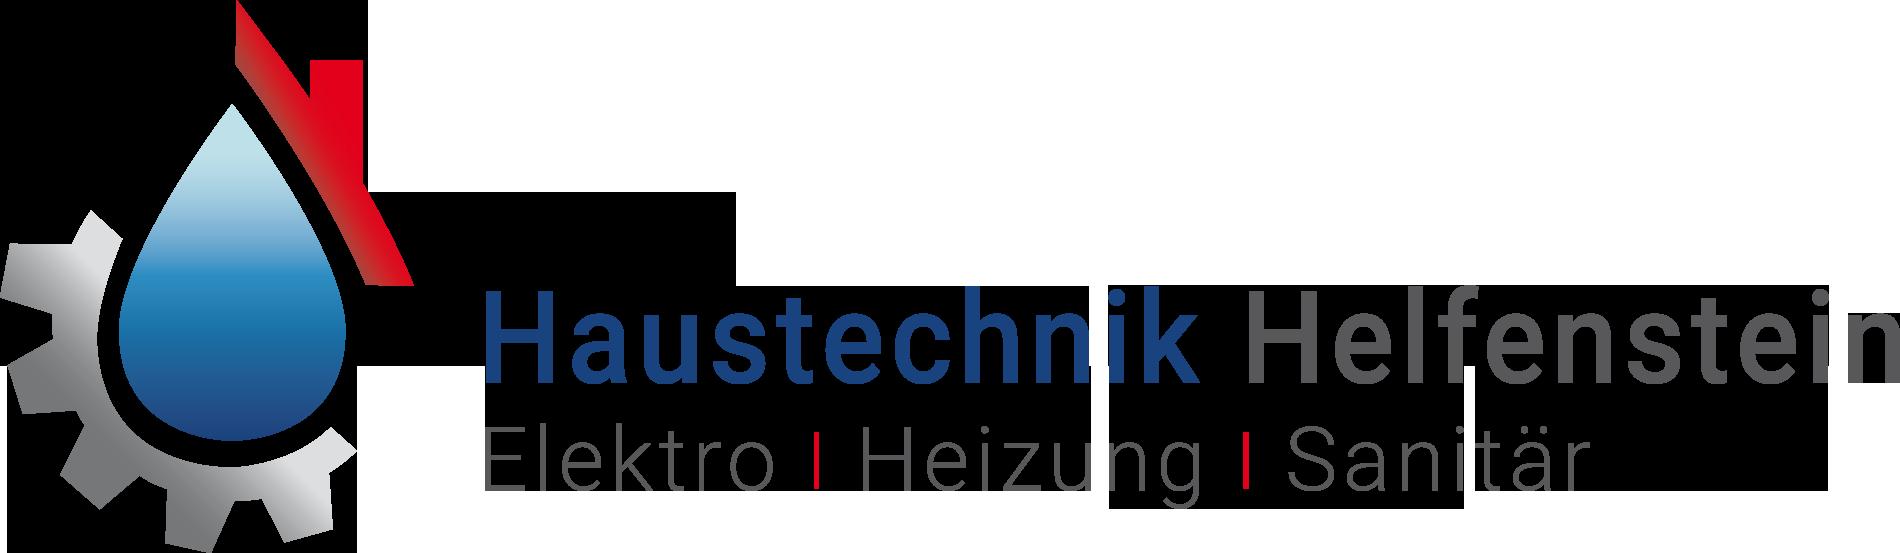 Haustechnik Helfenstein